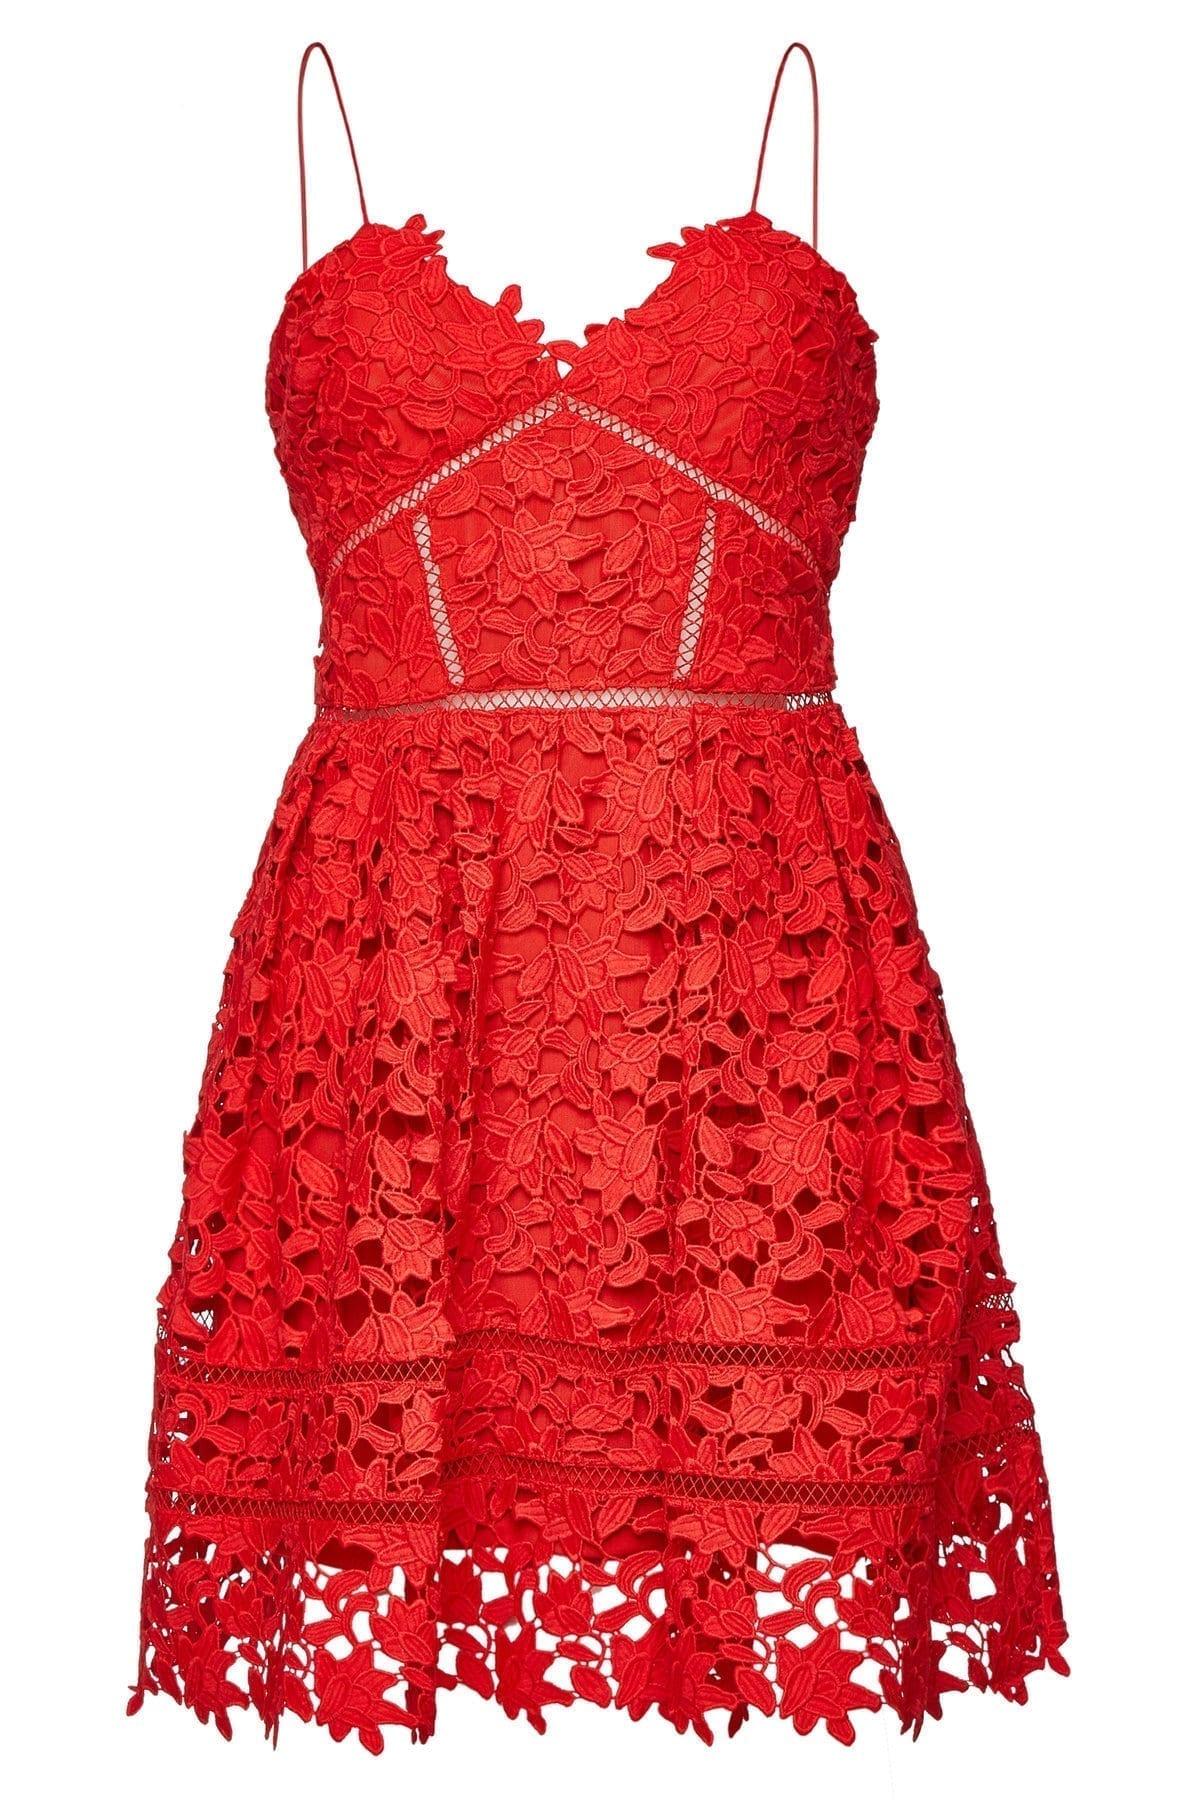 SELF-PORTRAIT Azaelea Lace Mini Red Dress